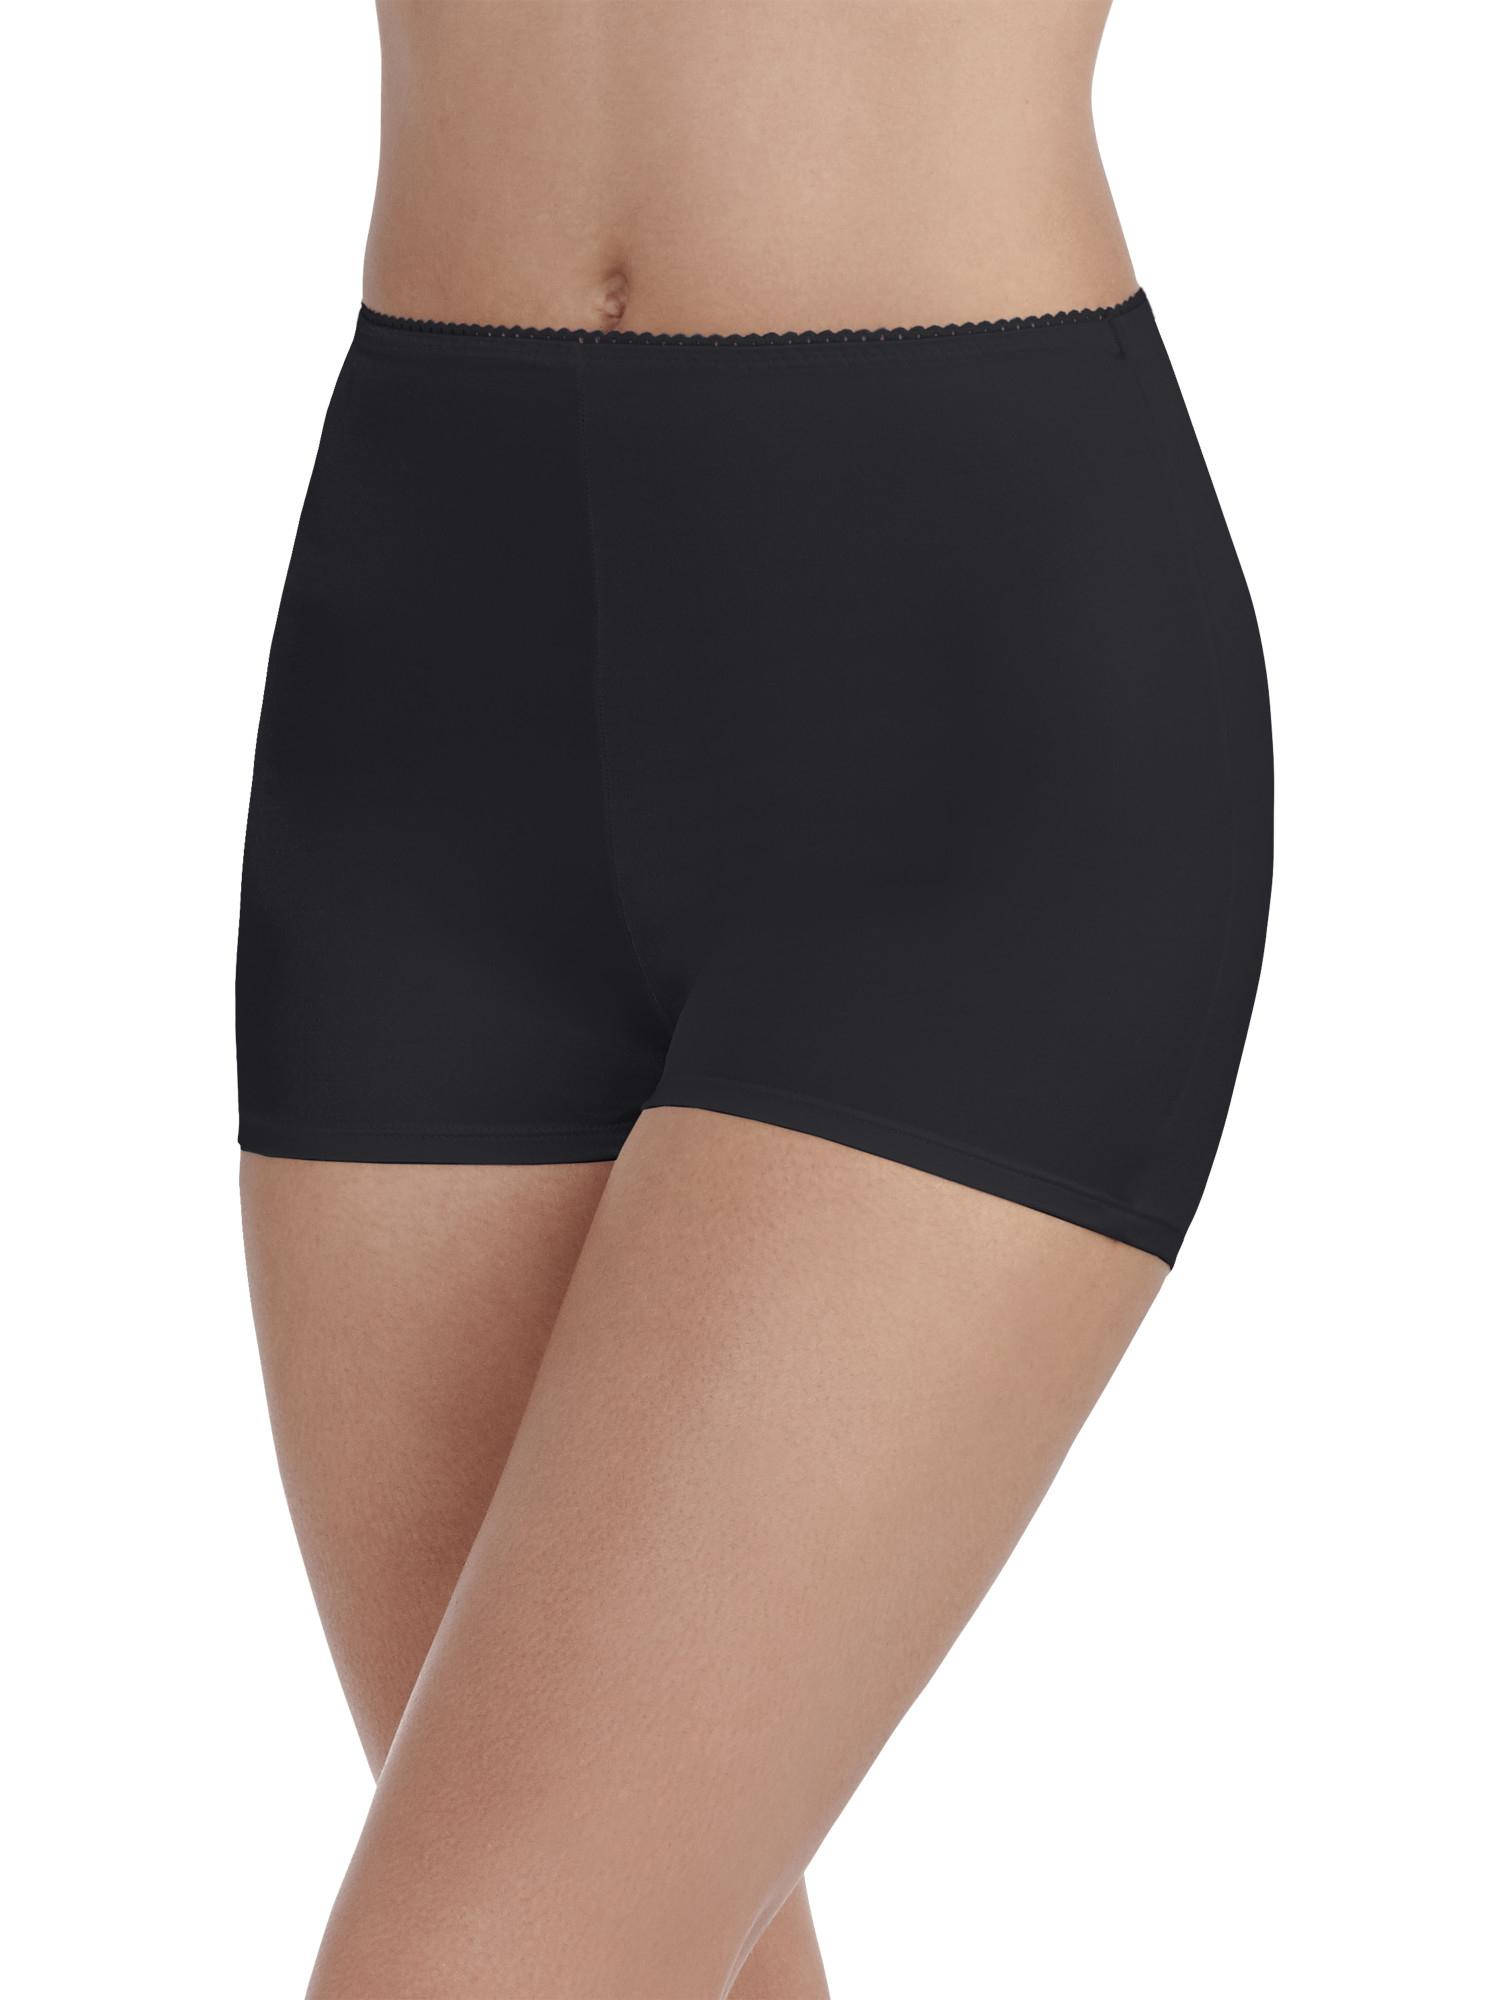 Women's Undershapers Light Control Boyshort Panty, 3 Pack, Style 3442301